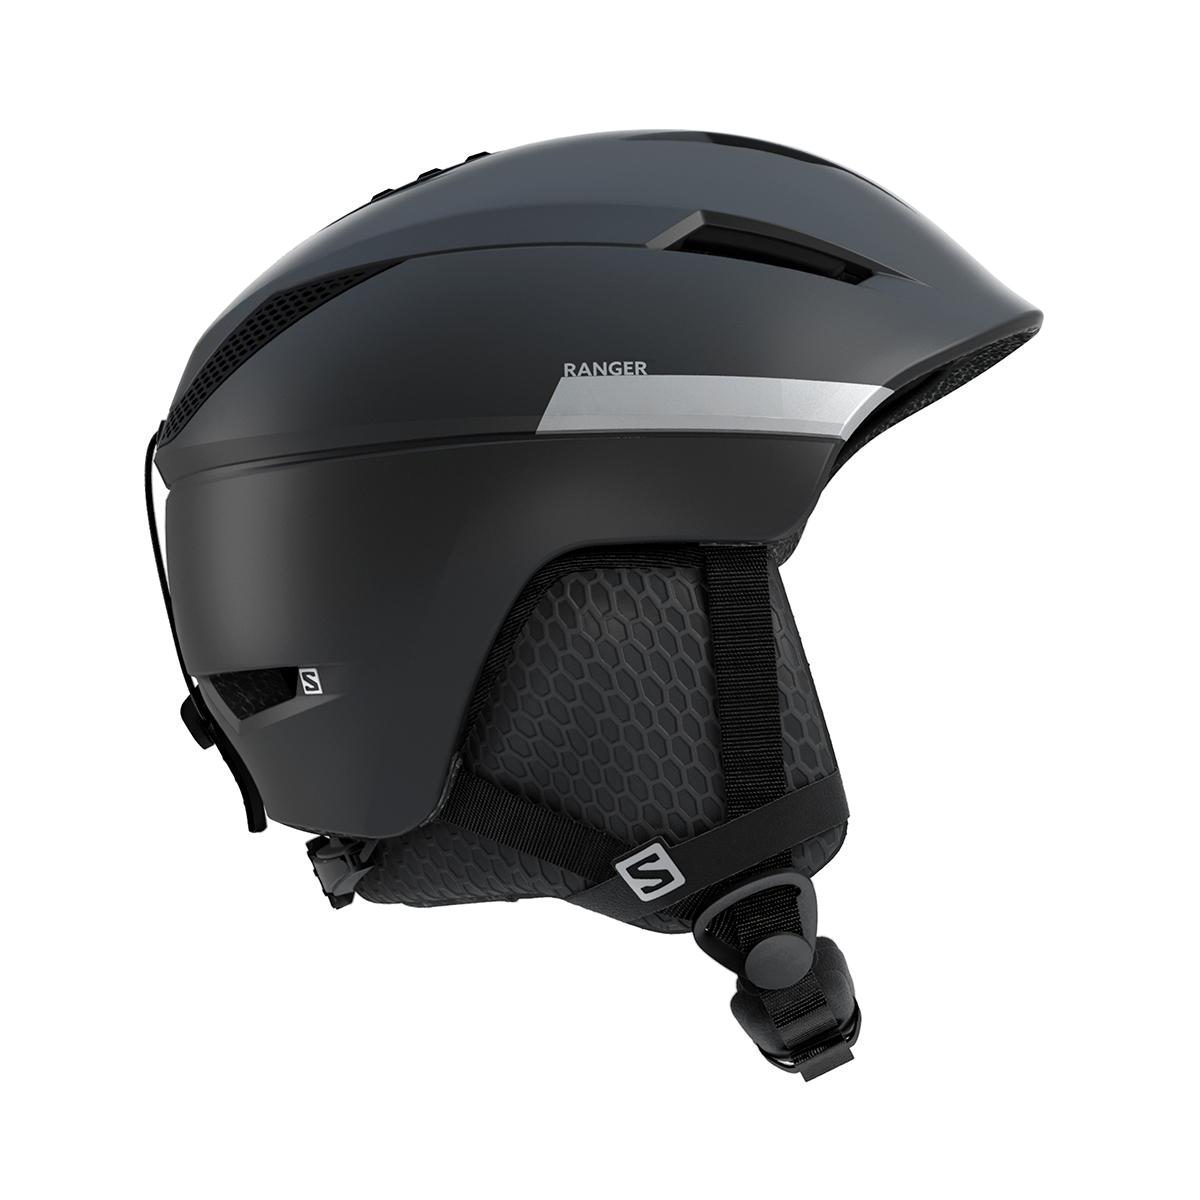 Prezzi Salomon casco ranger 2 mips